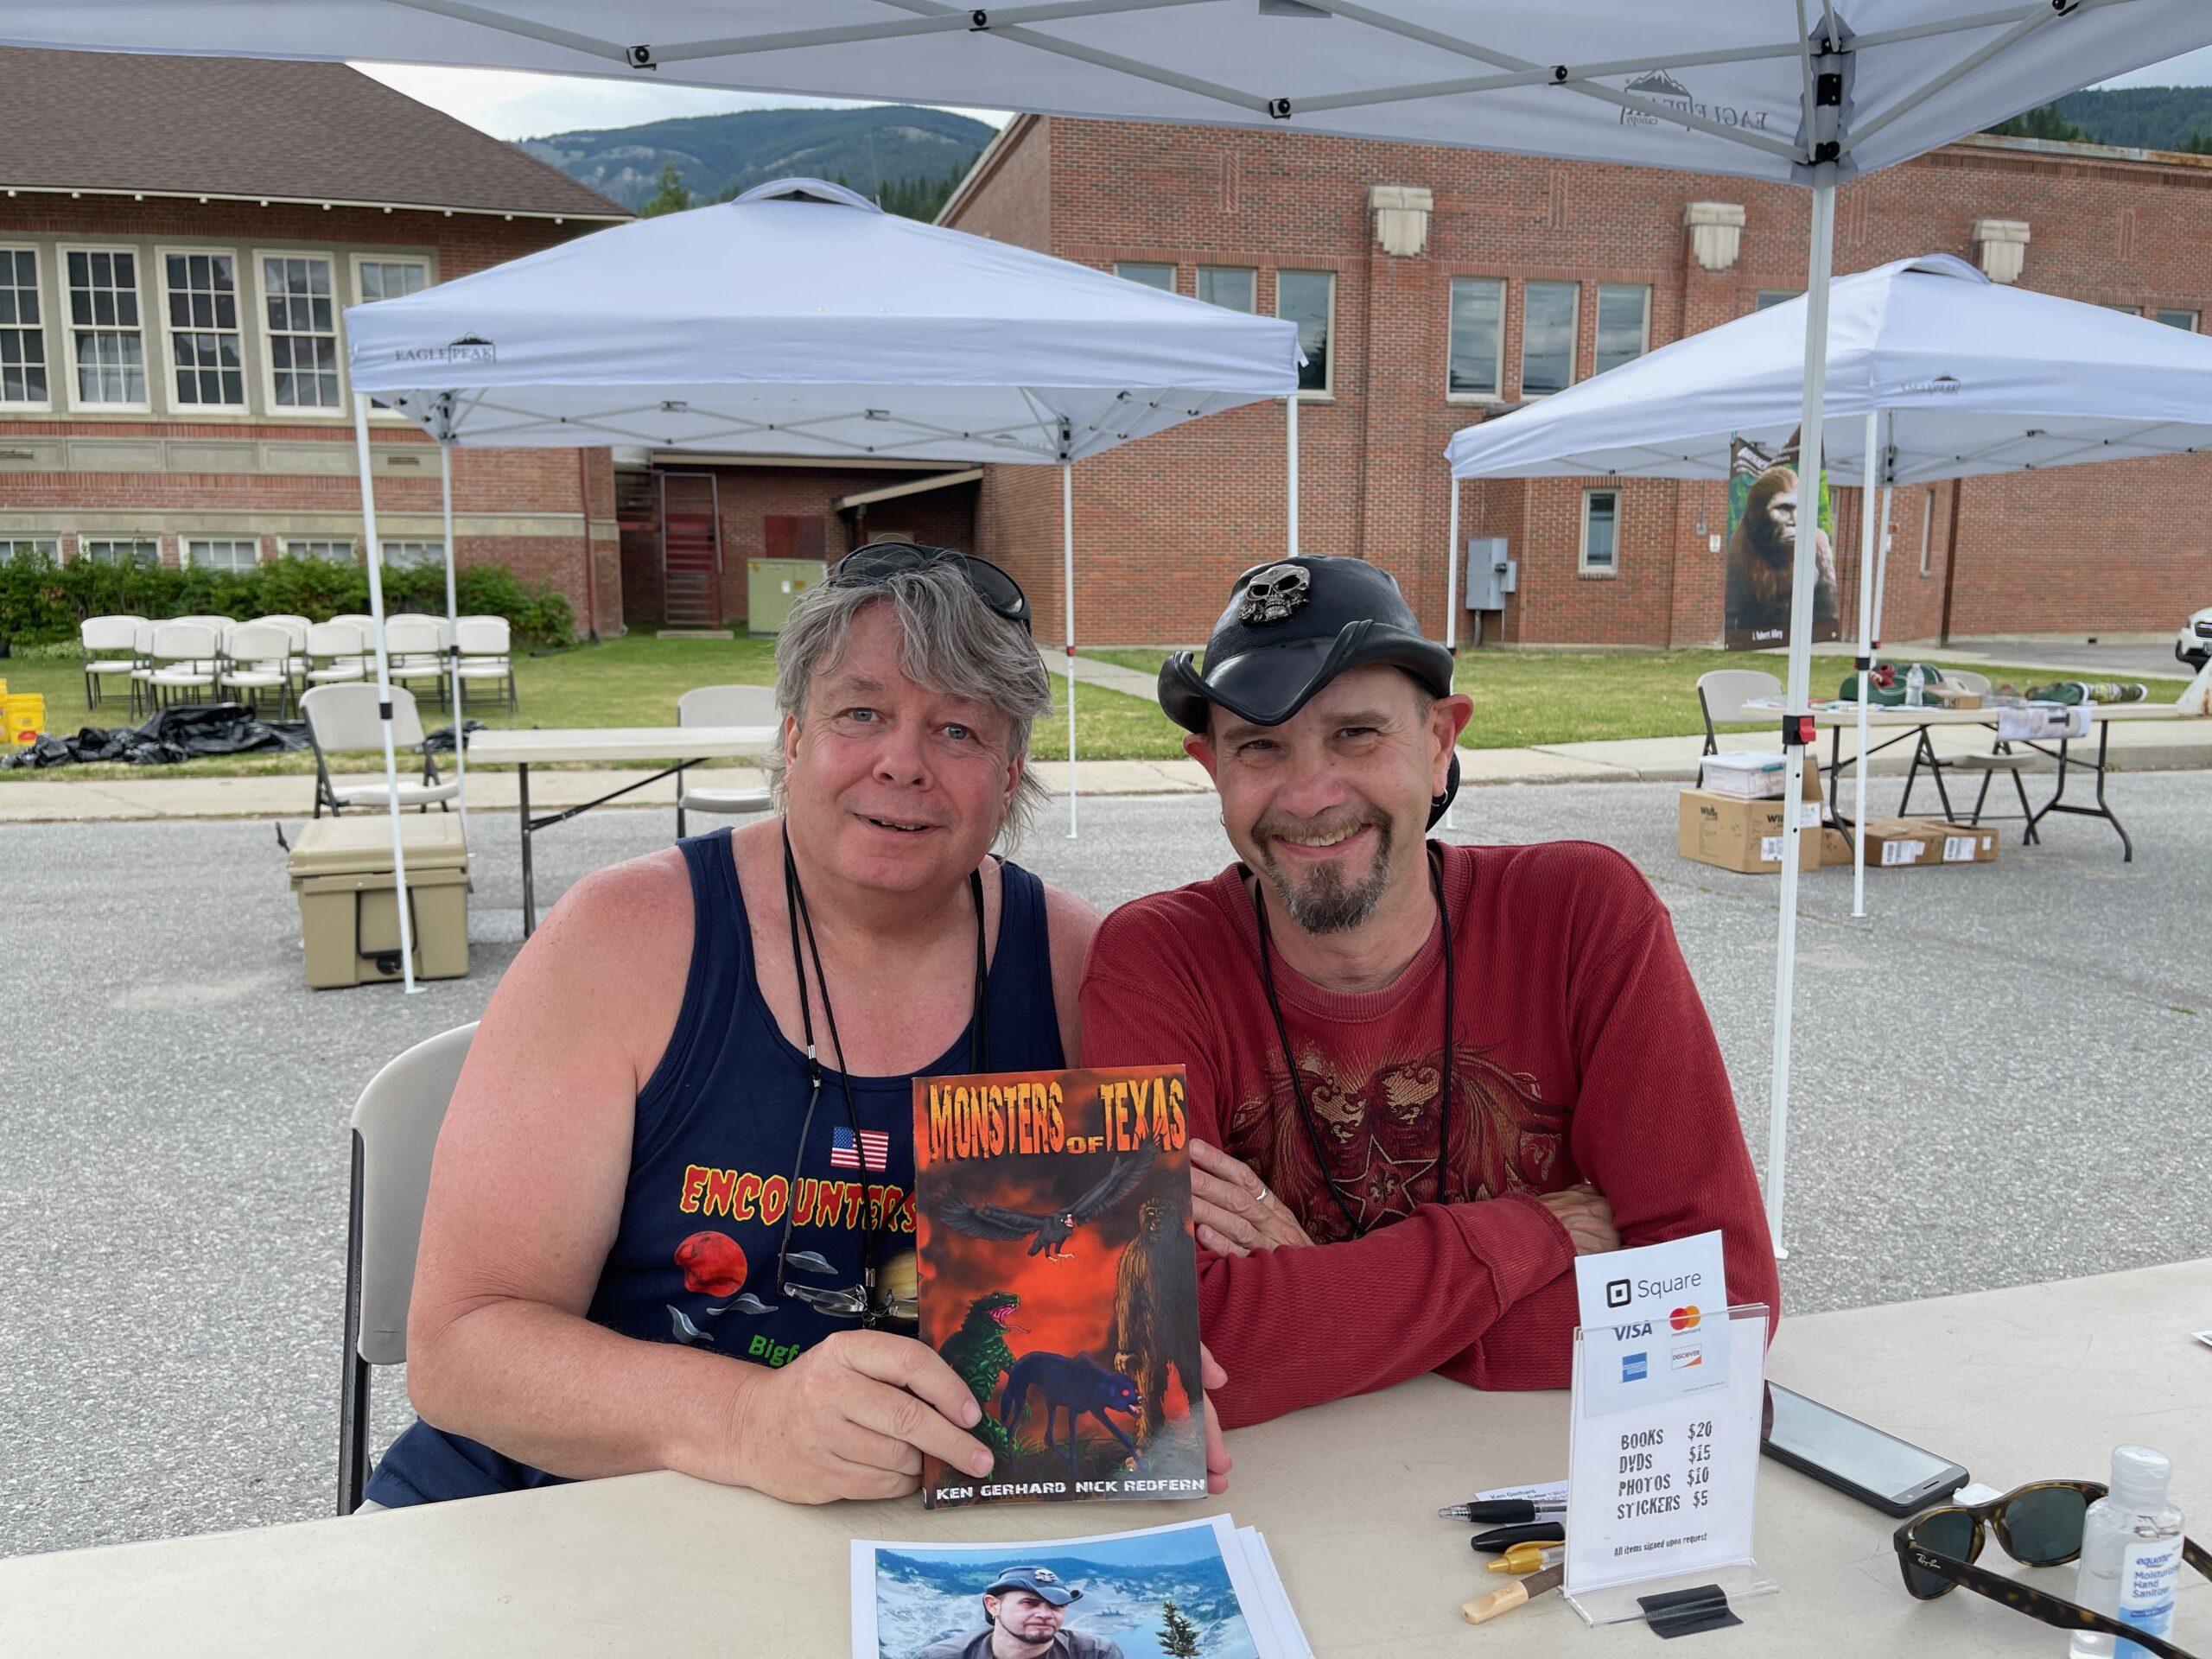 Metaline Falls Bigfoot Festival Press Pass Is Now On Vimeo!